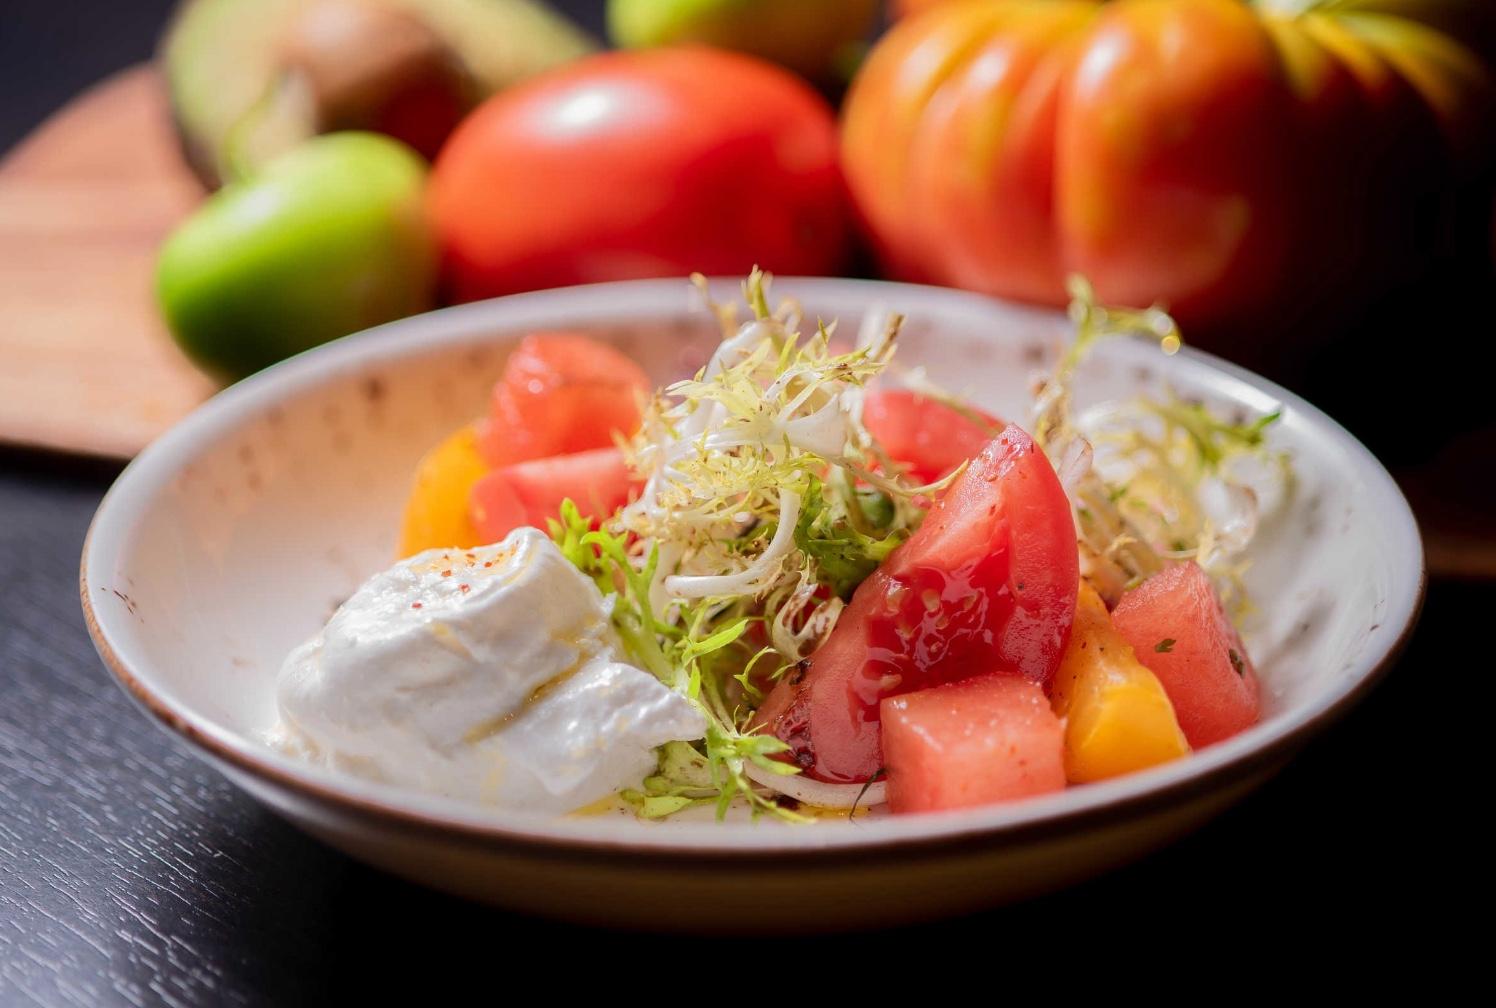 Burrata with Watermelon + Black Garlic from Chef Jean Delgado